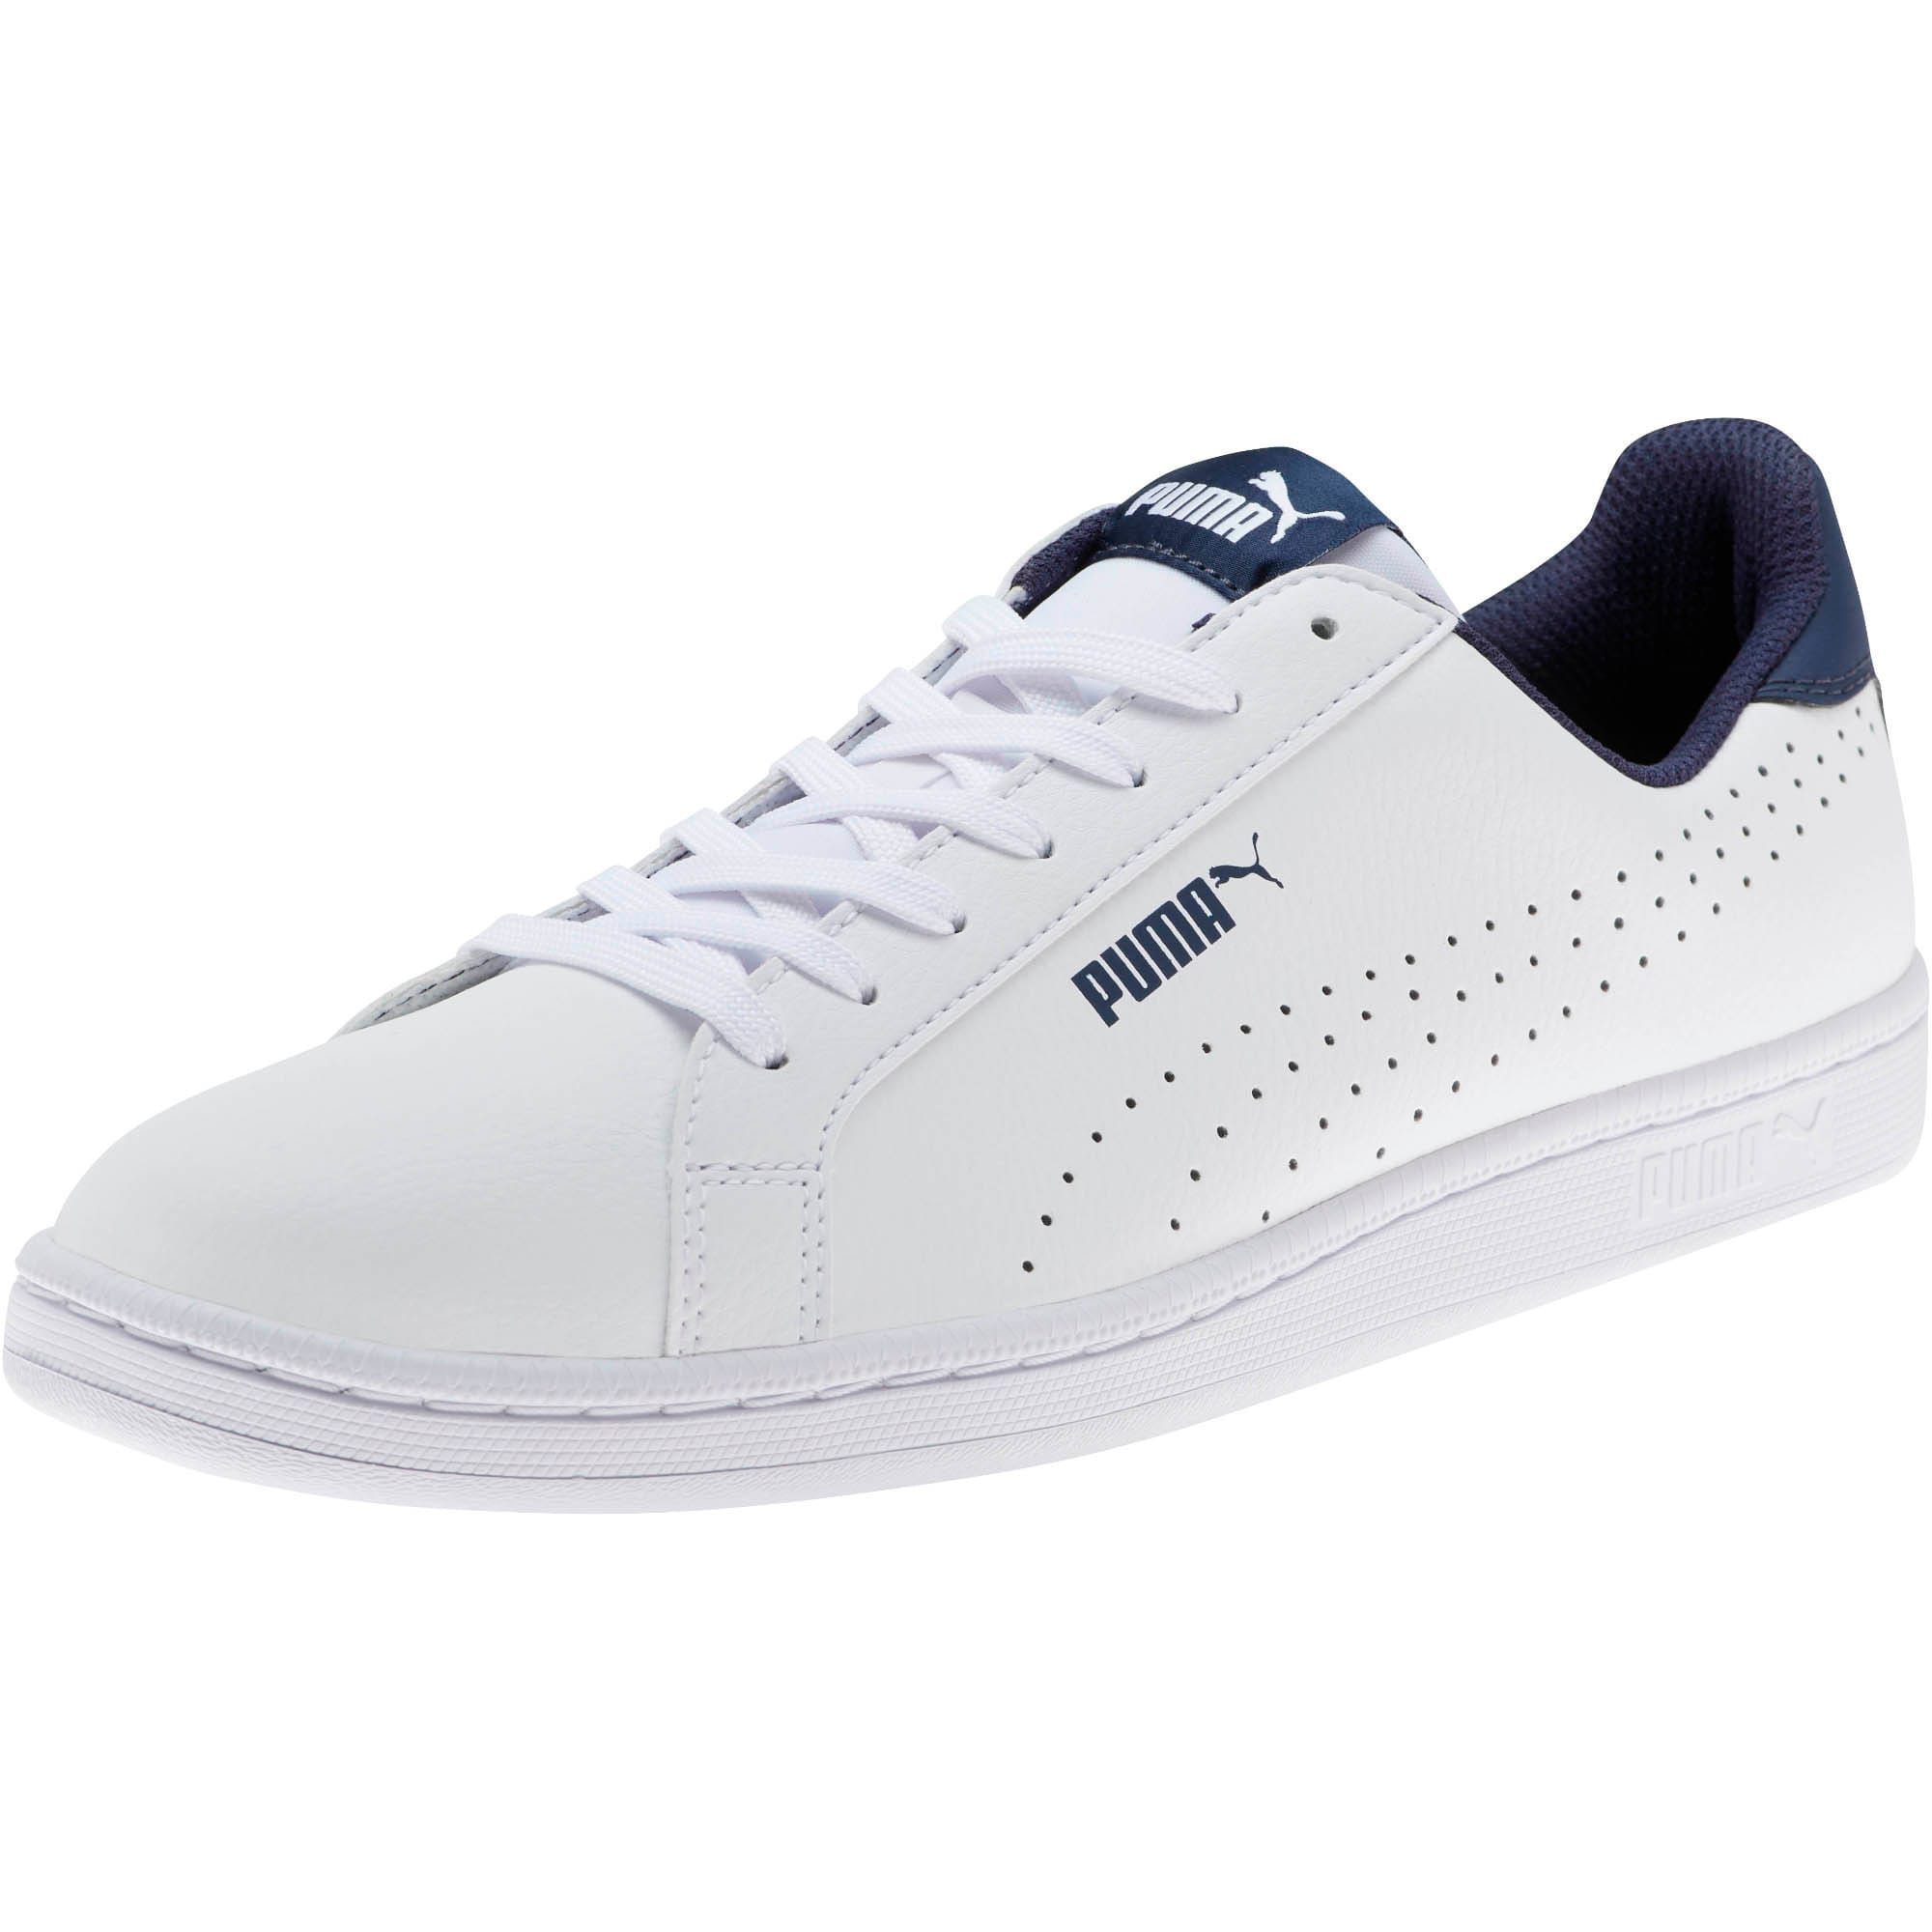 Thumbnail 1 of PUMA Smash Perf Sneakers, Puma White-Peacoat, medium